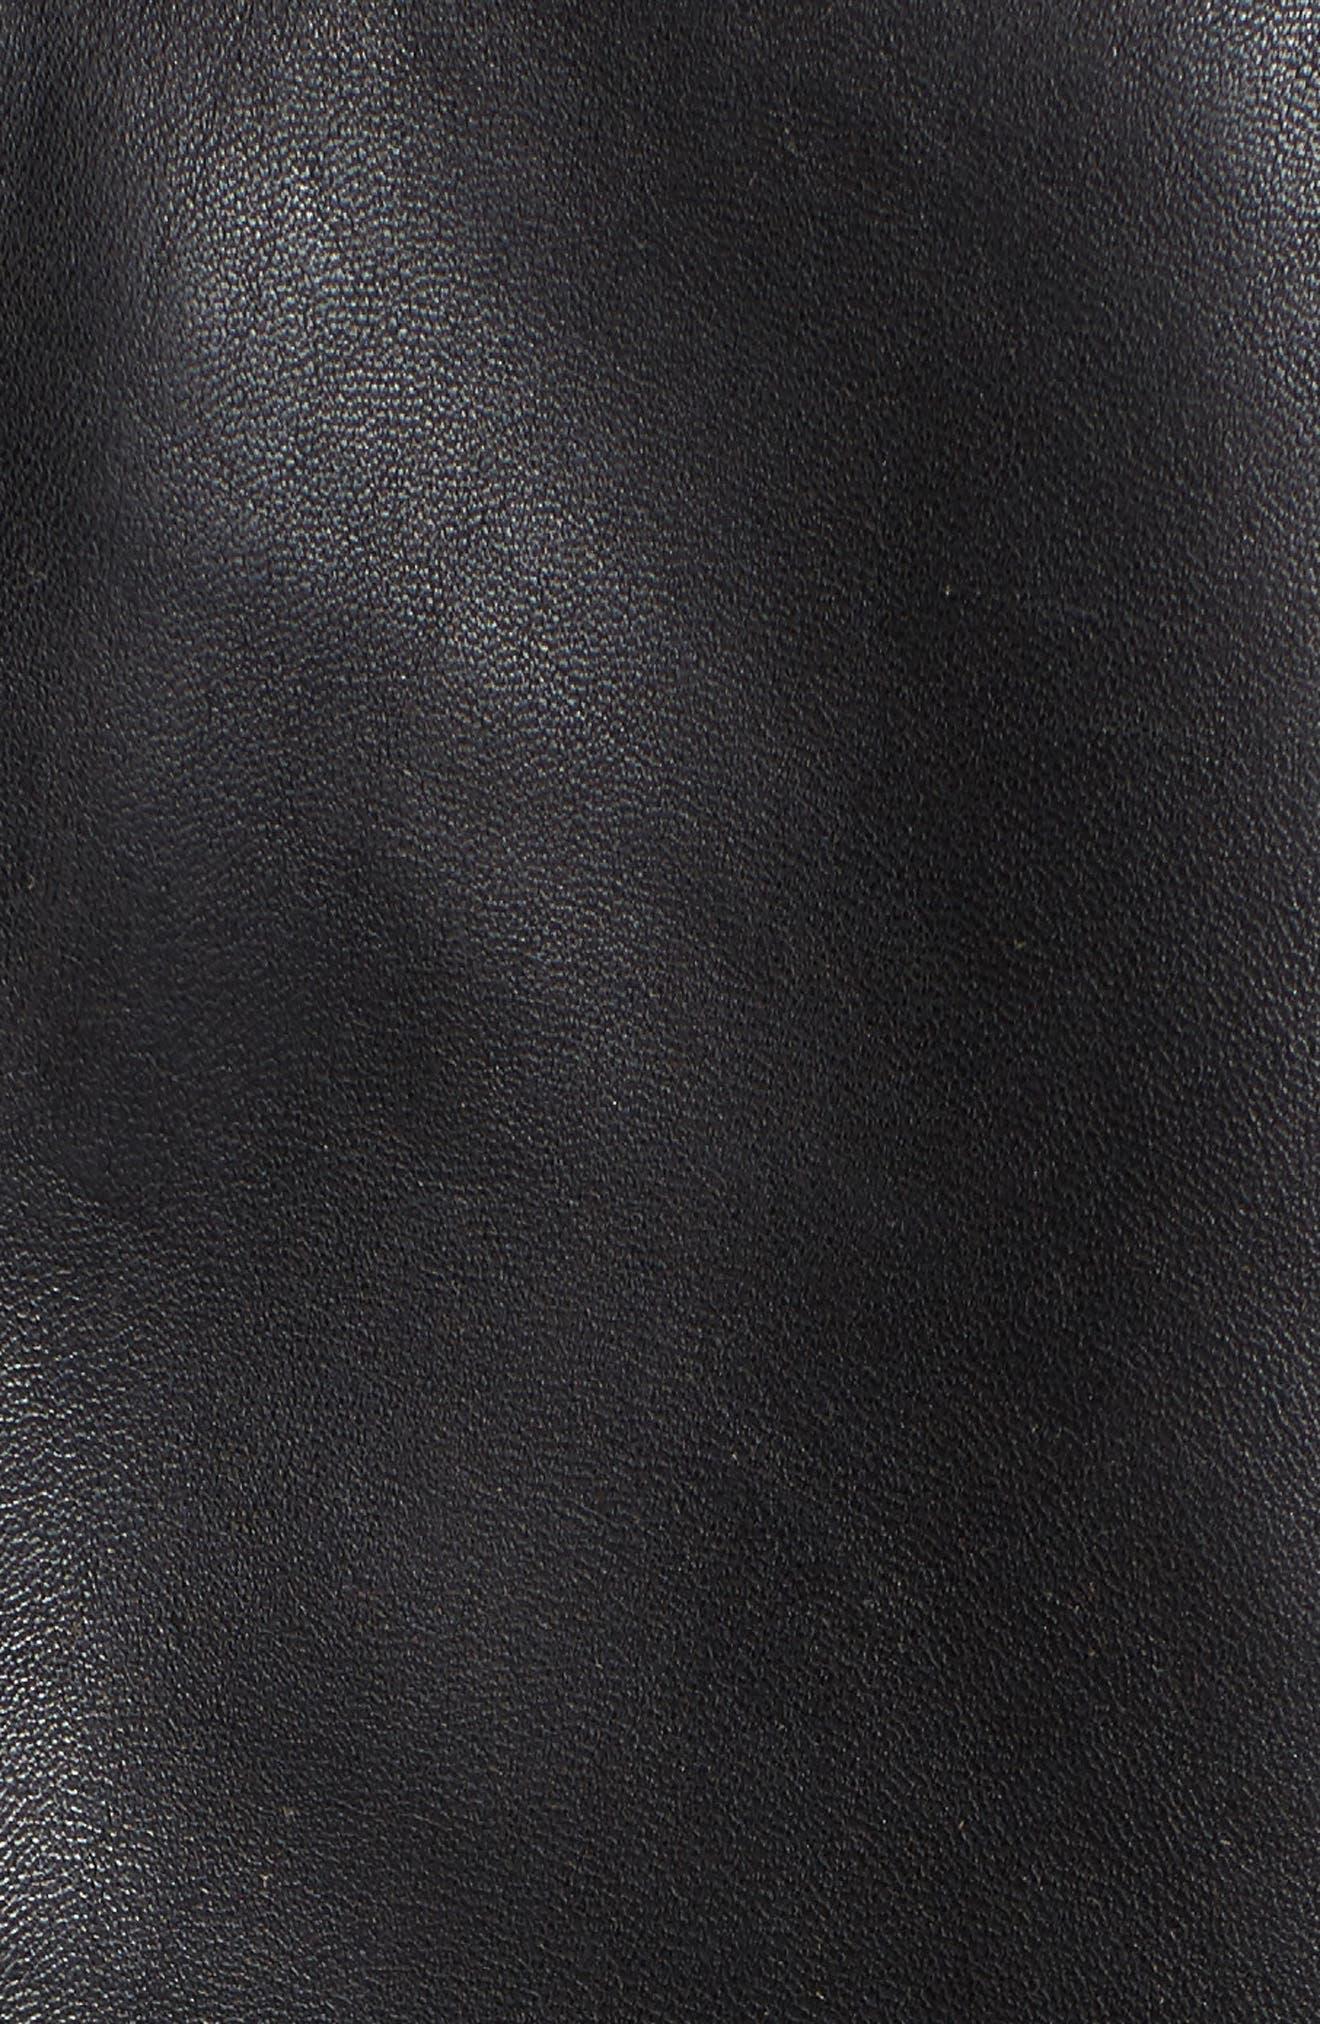 Regular Fit Leather Jacket,                             Alternate thumbnail 6, color,                             BLACK